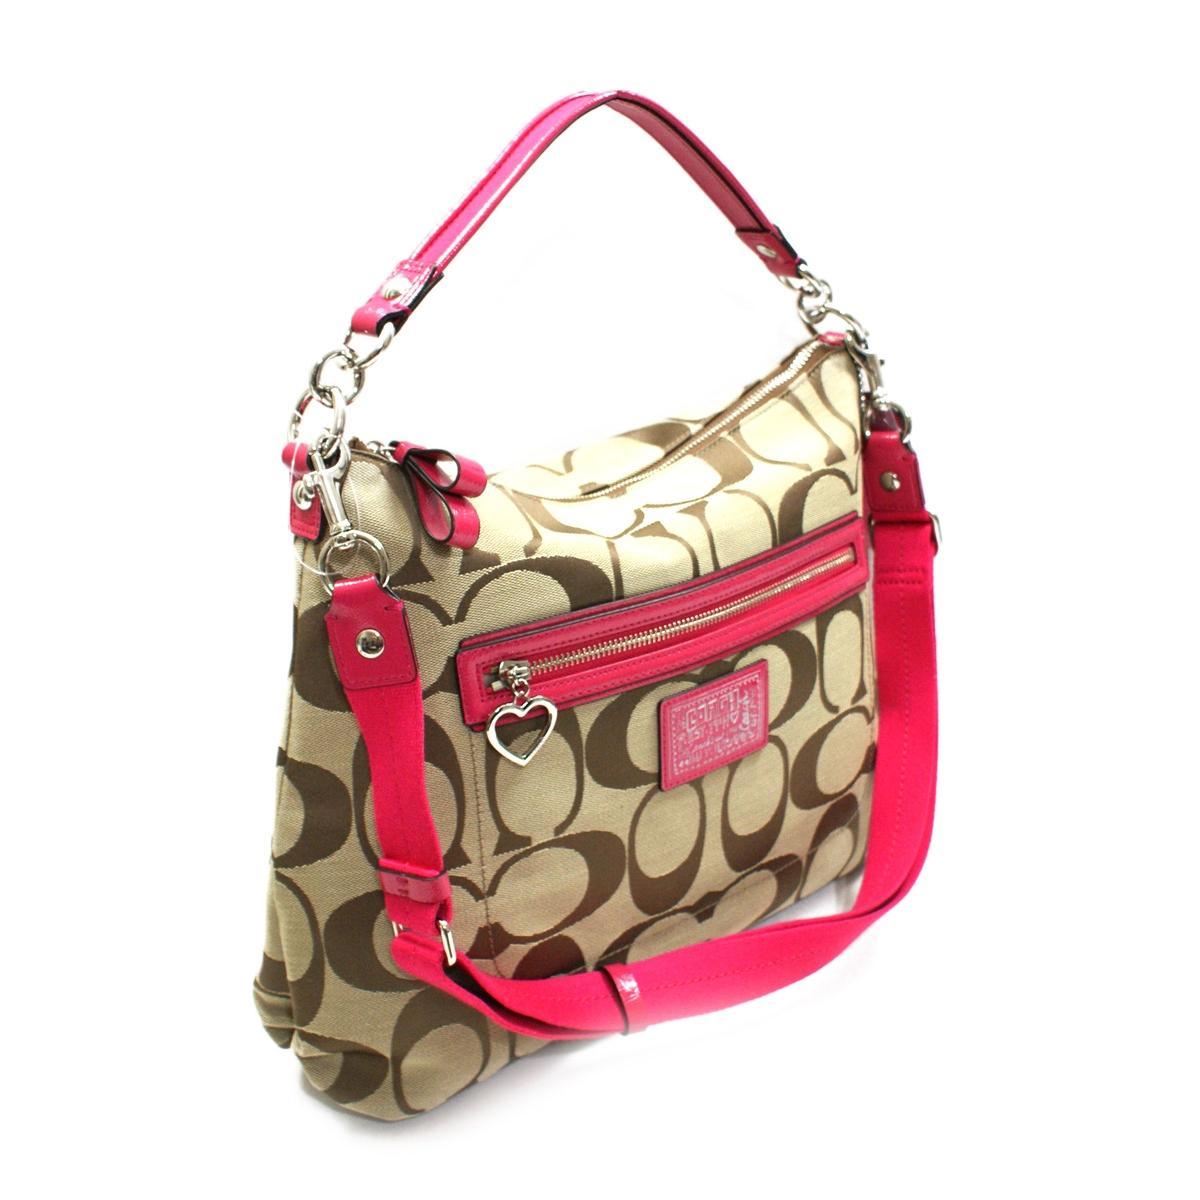 crossbody bags designer 5qm1  crossbody bags designer